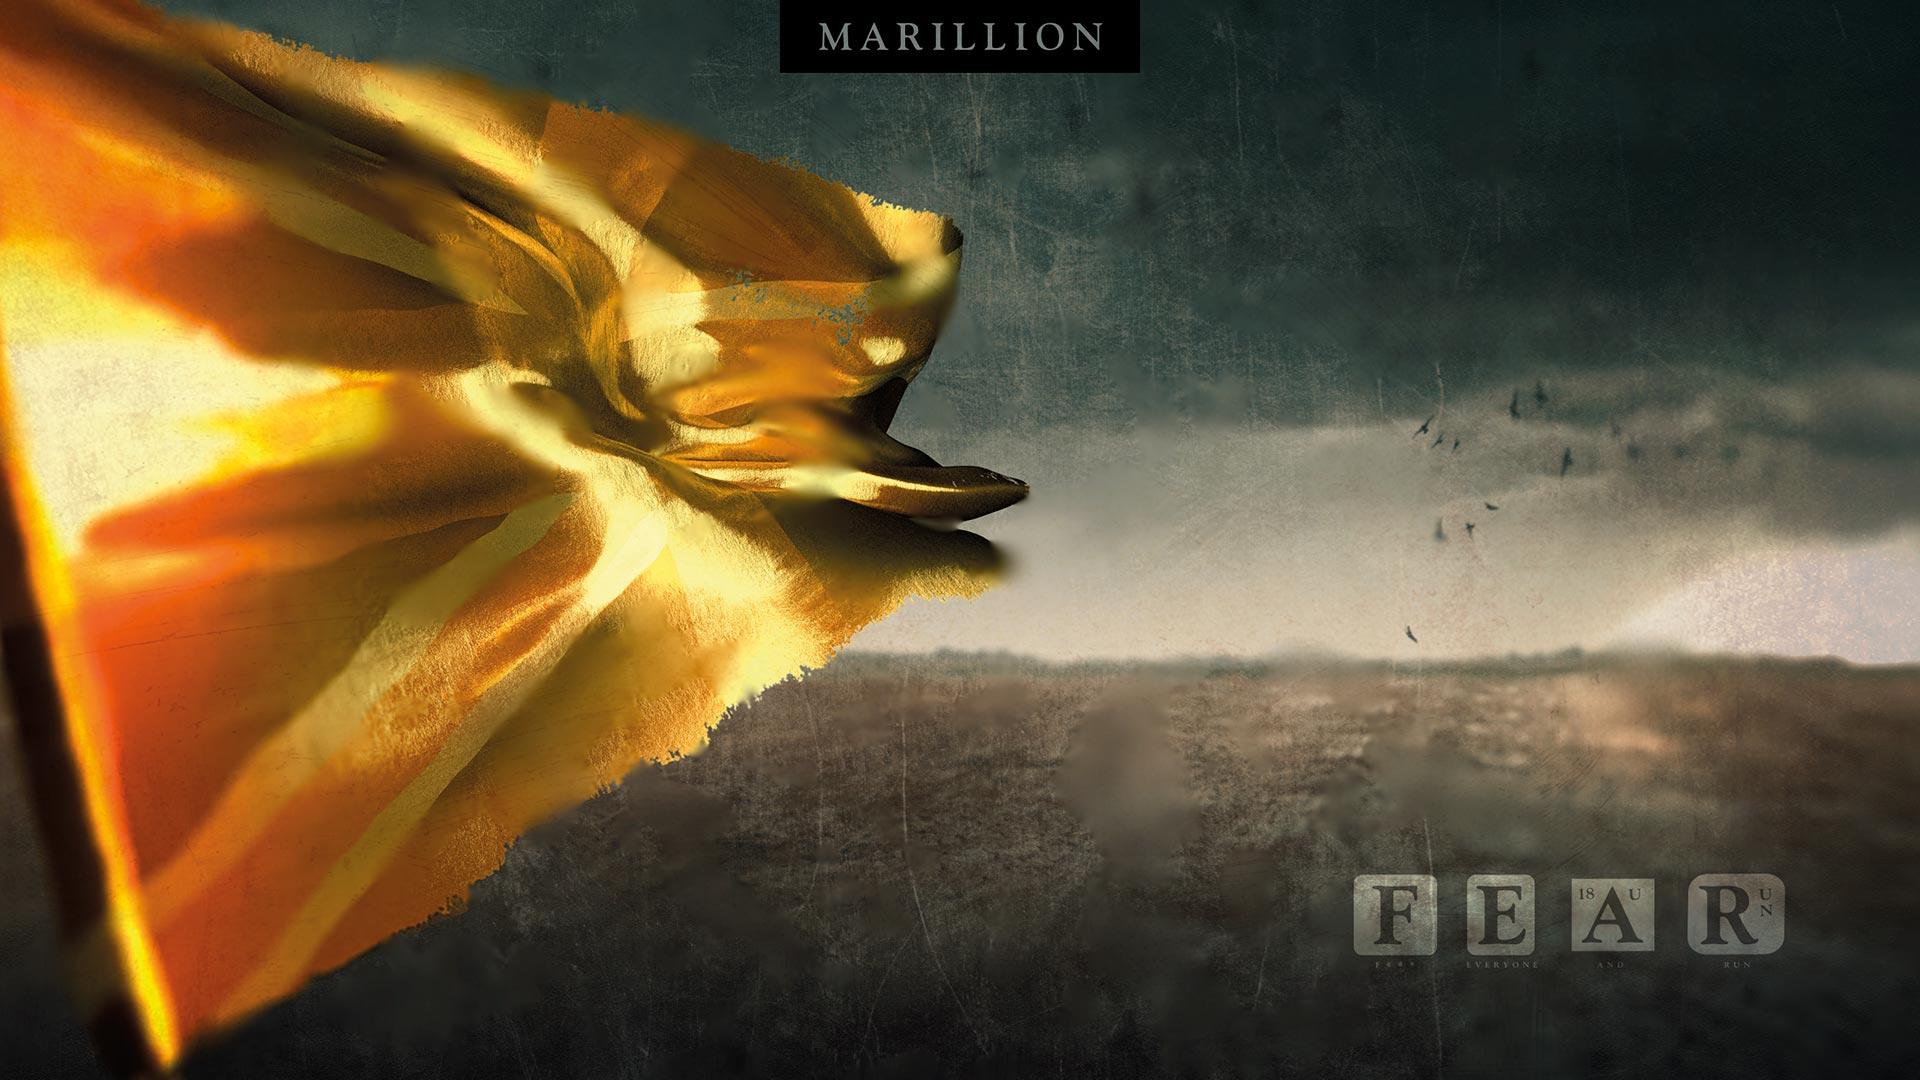 Hd Live Wallpaper For Tablet Marillion Com The Official Marillion Website